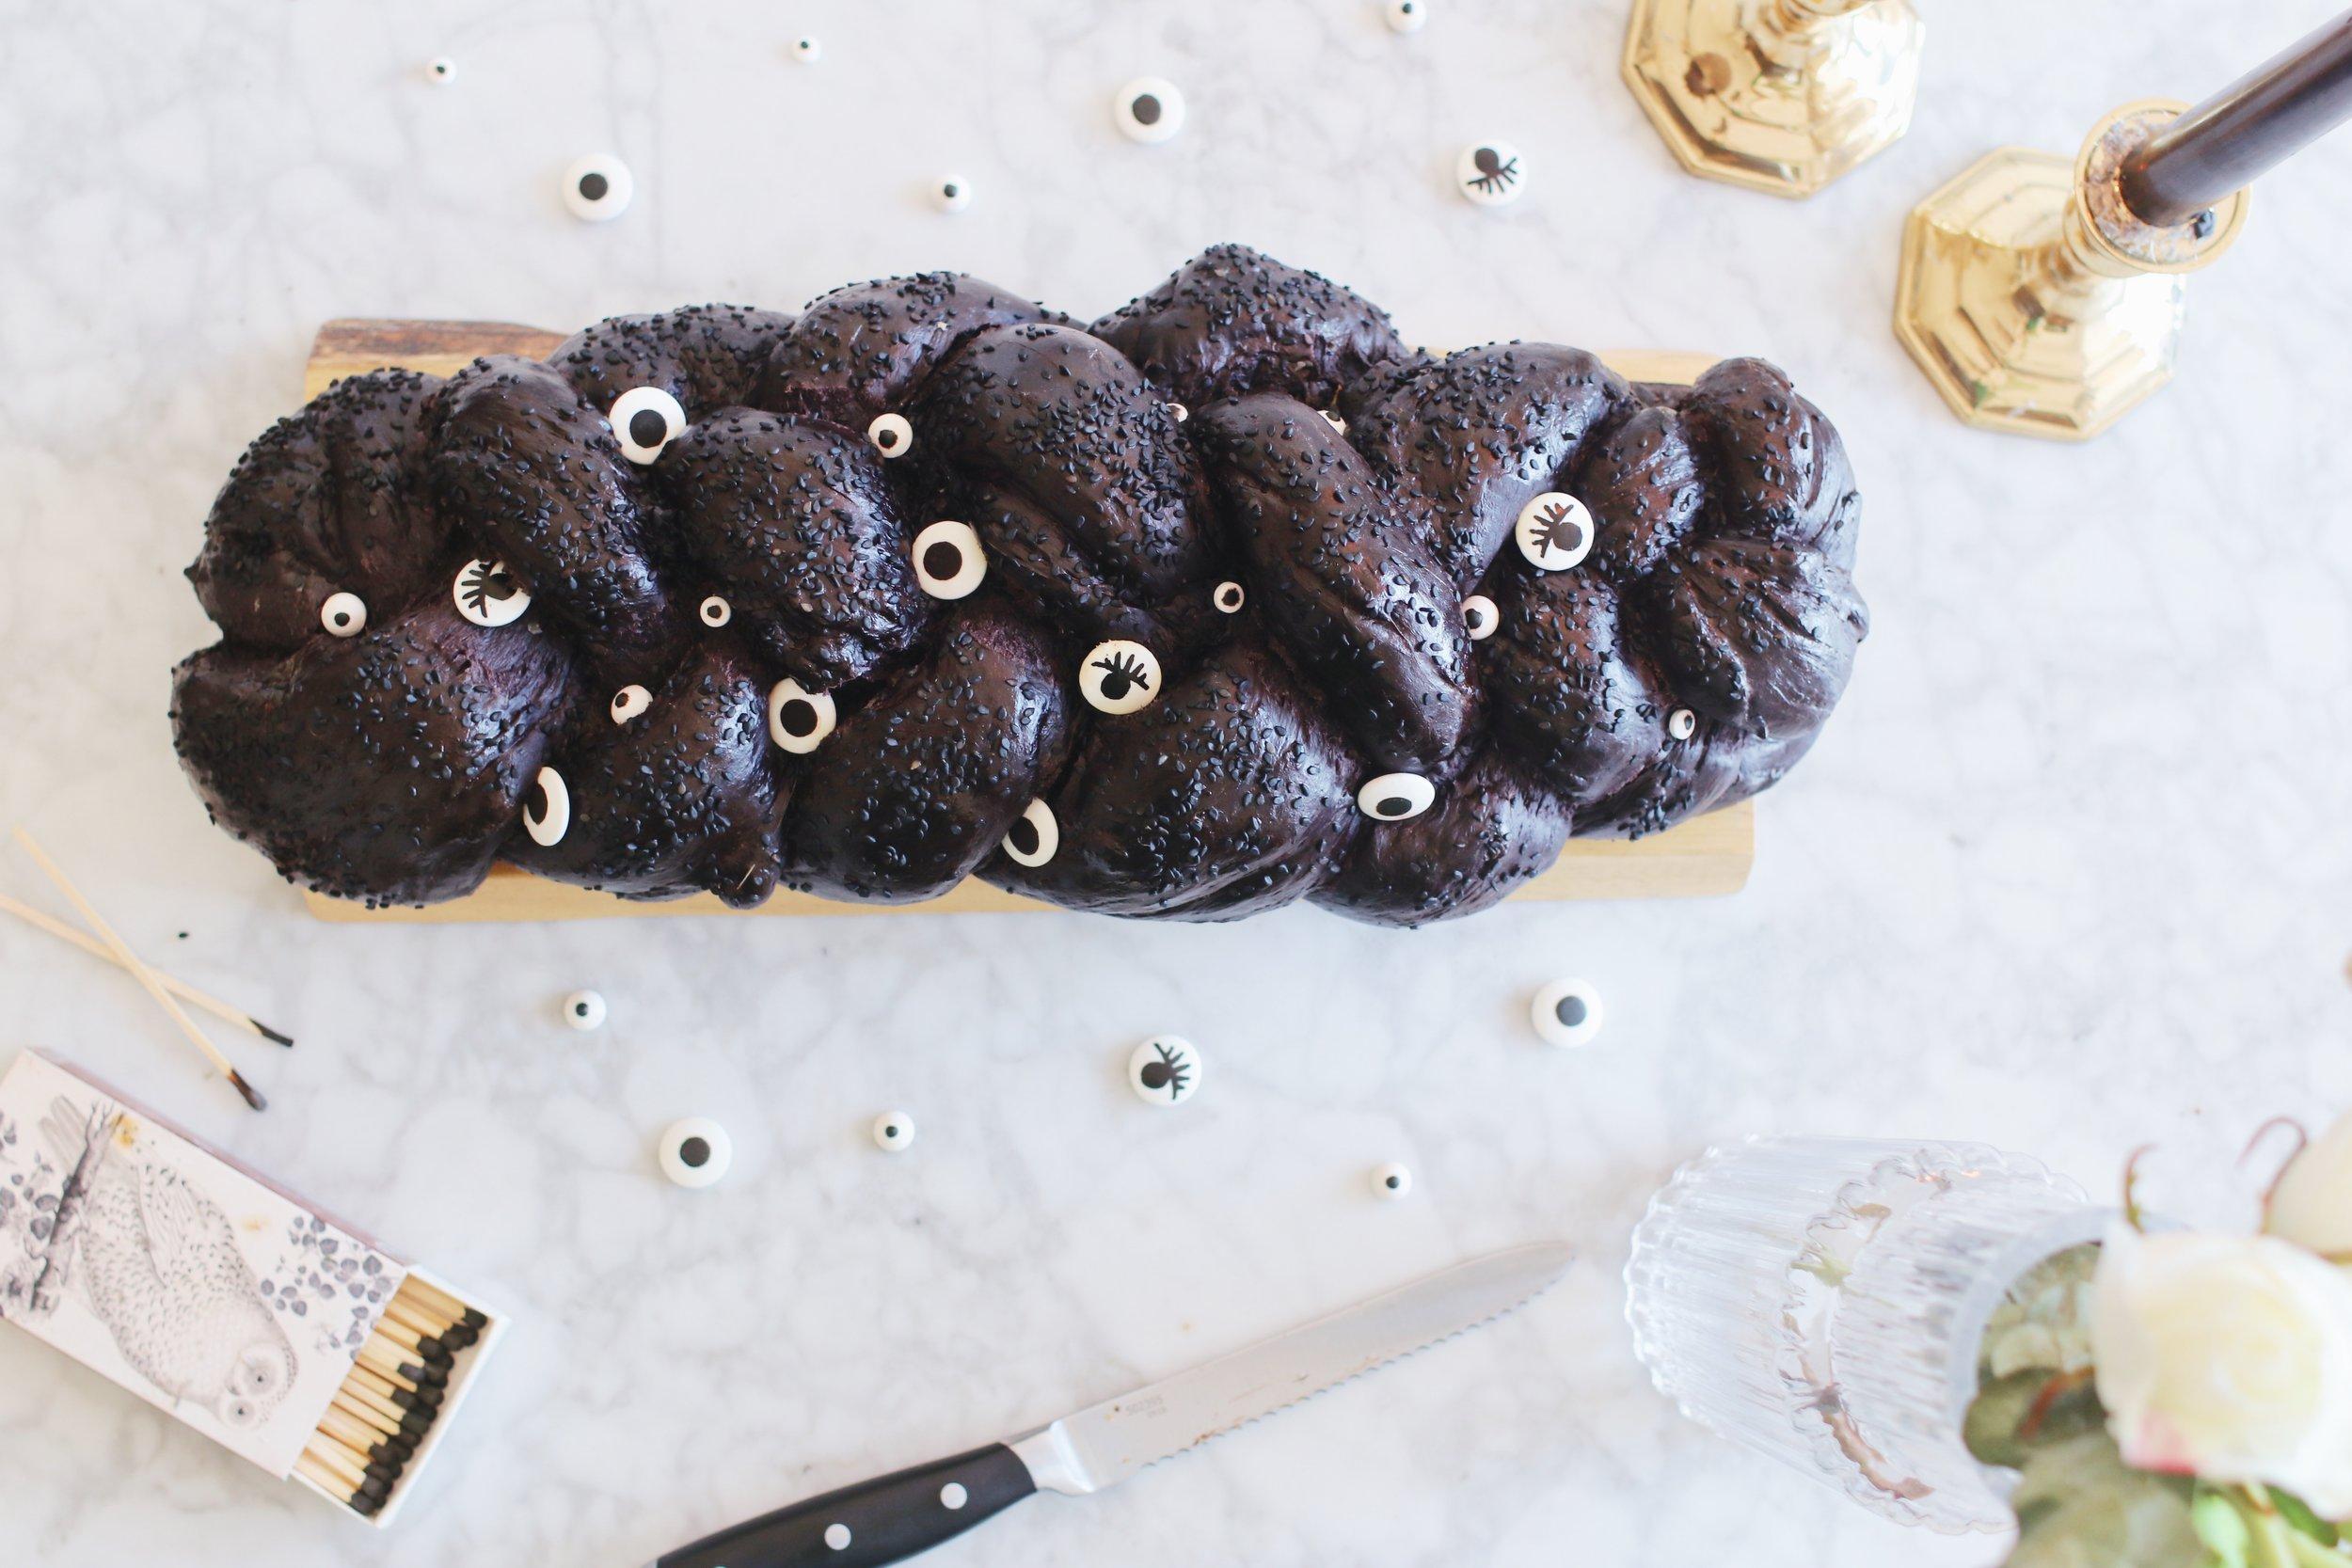 halloween-shabbat-ideas-black-challah-recipe-googly-eyes-4.JPG